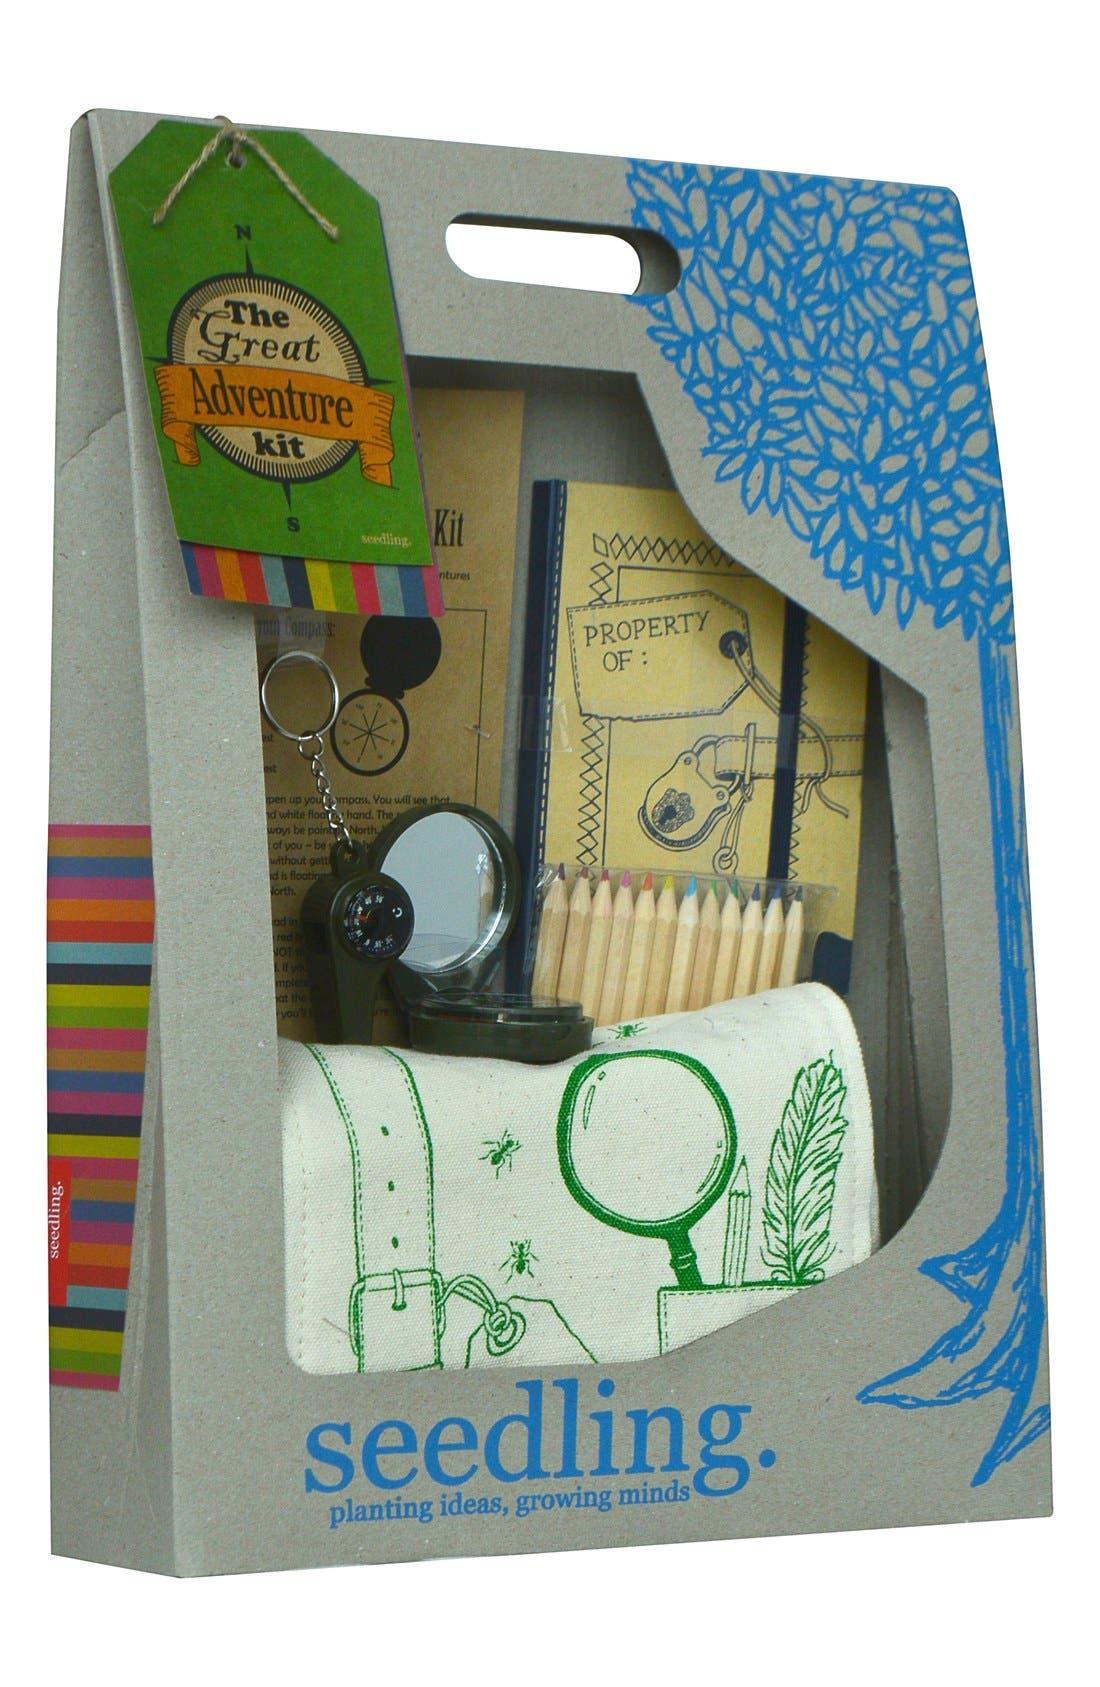 seedling 'The Great Adventure' Kit